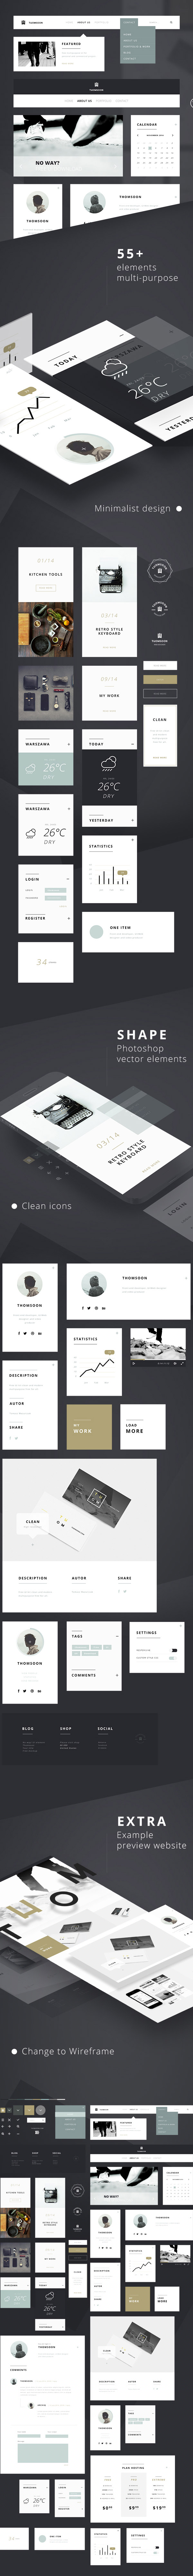 55-free-ui-kit-elements